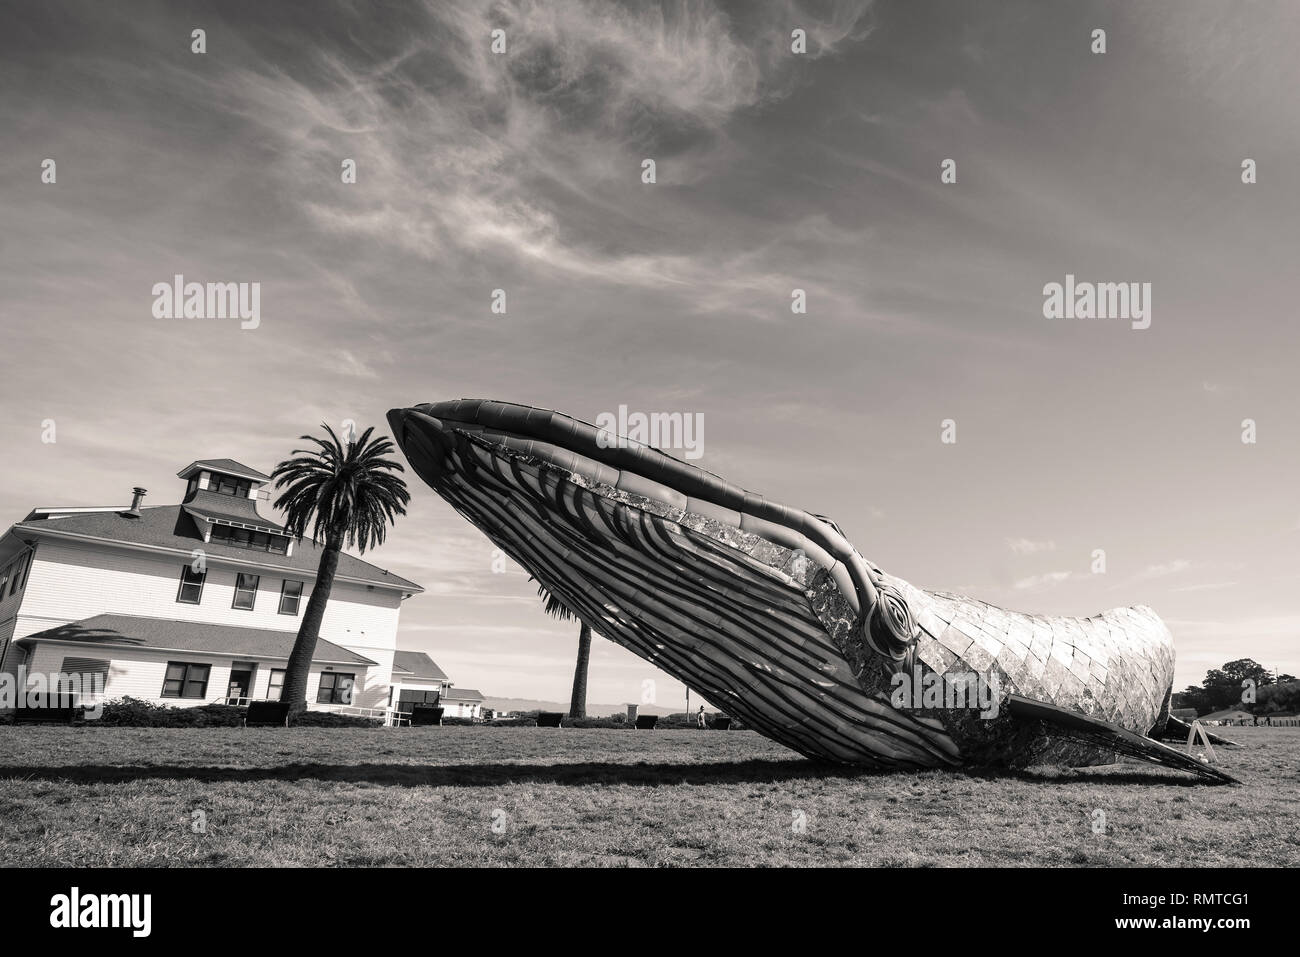 The Monterey Bay Aquarium's Blue Whale art exhibit on Crissy Field. San Francisco. - Stock Image